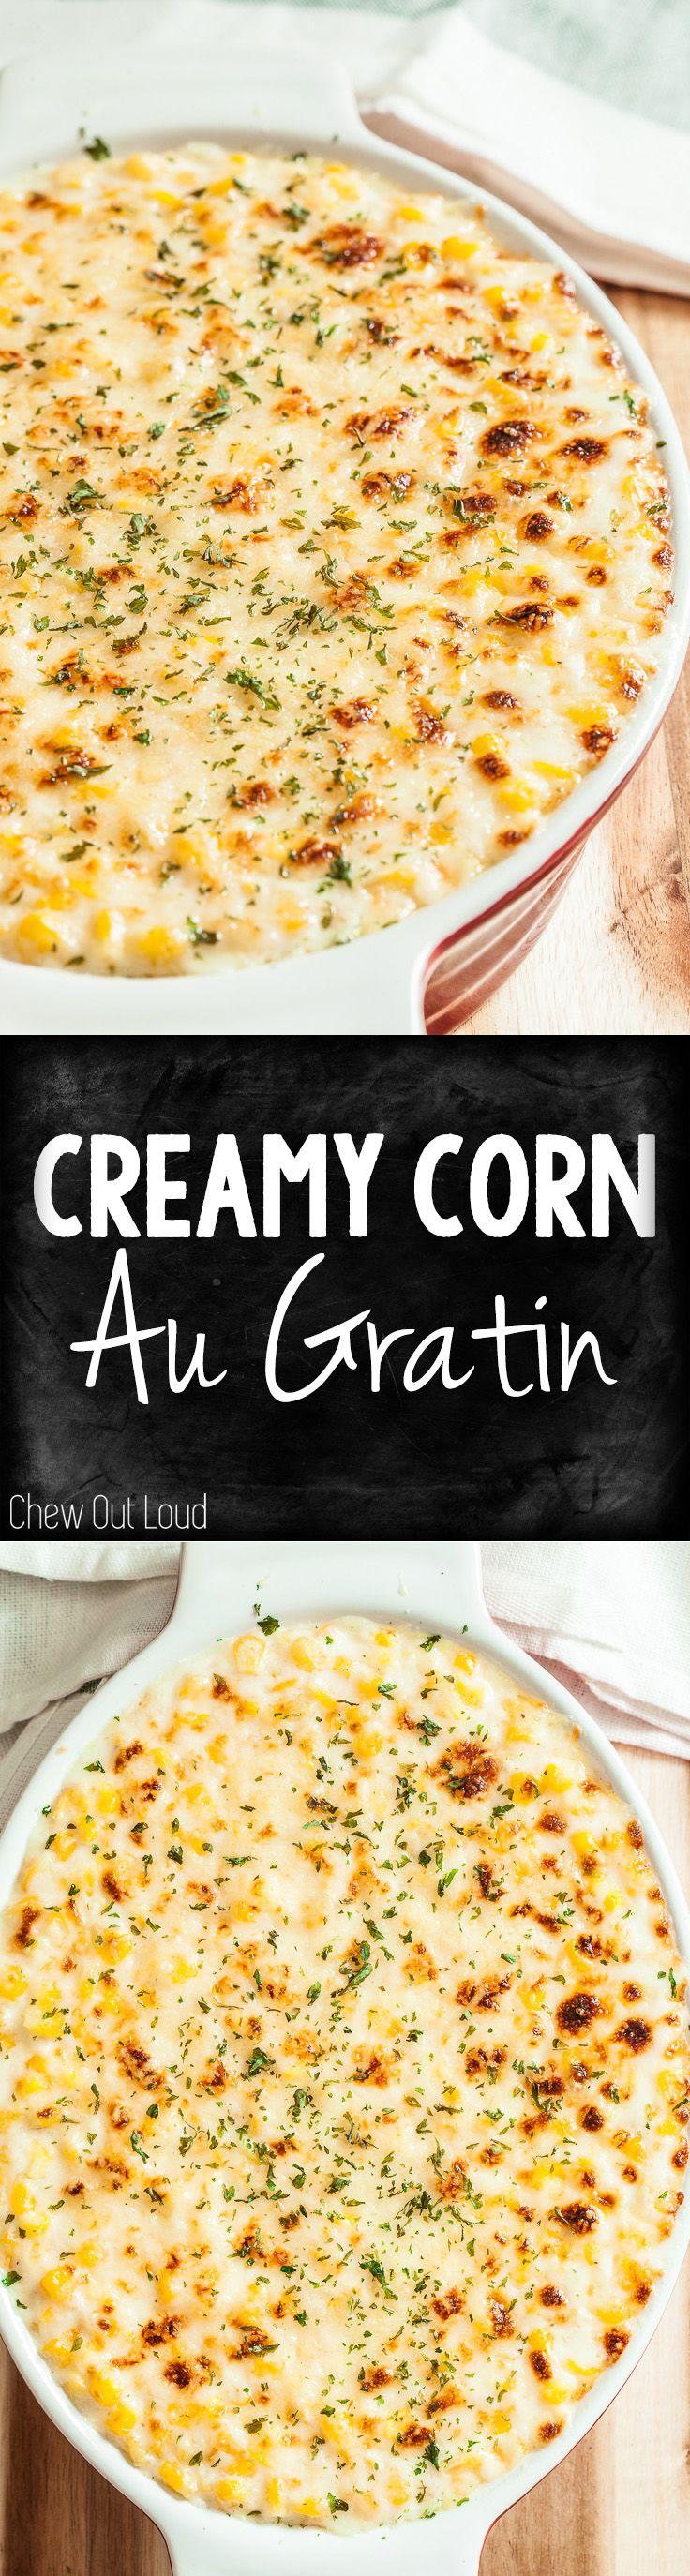 Summit House Restaurant's popular Creamed Corn Au Gratin. So, So Good! #corn #side #holiday